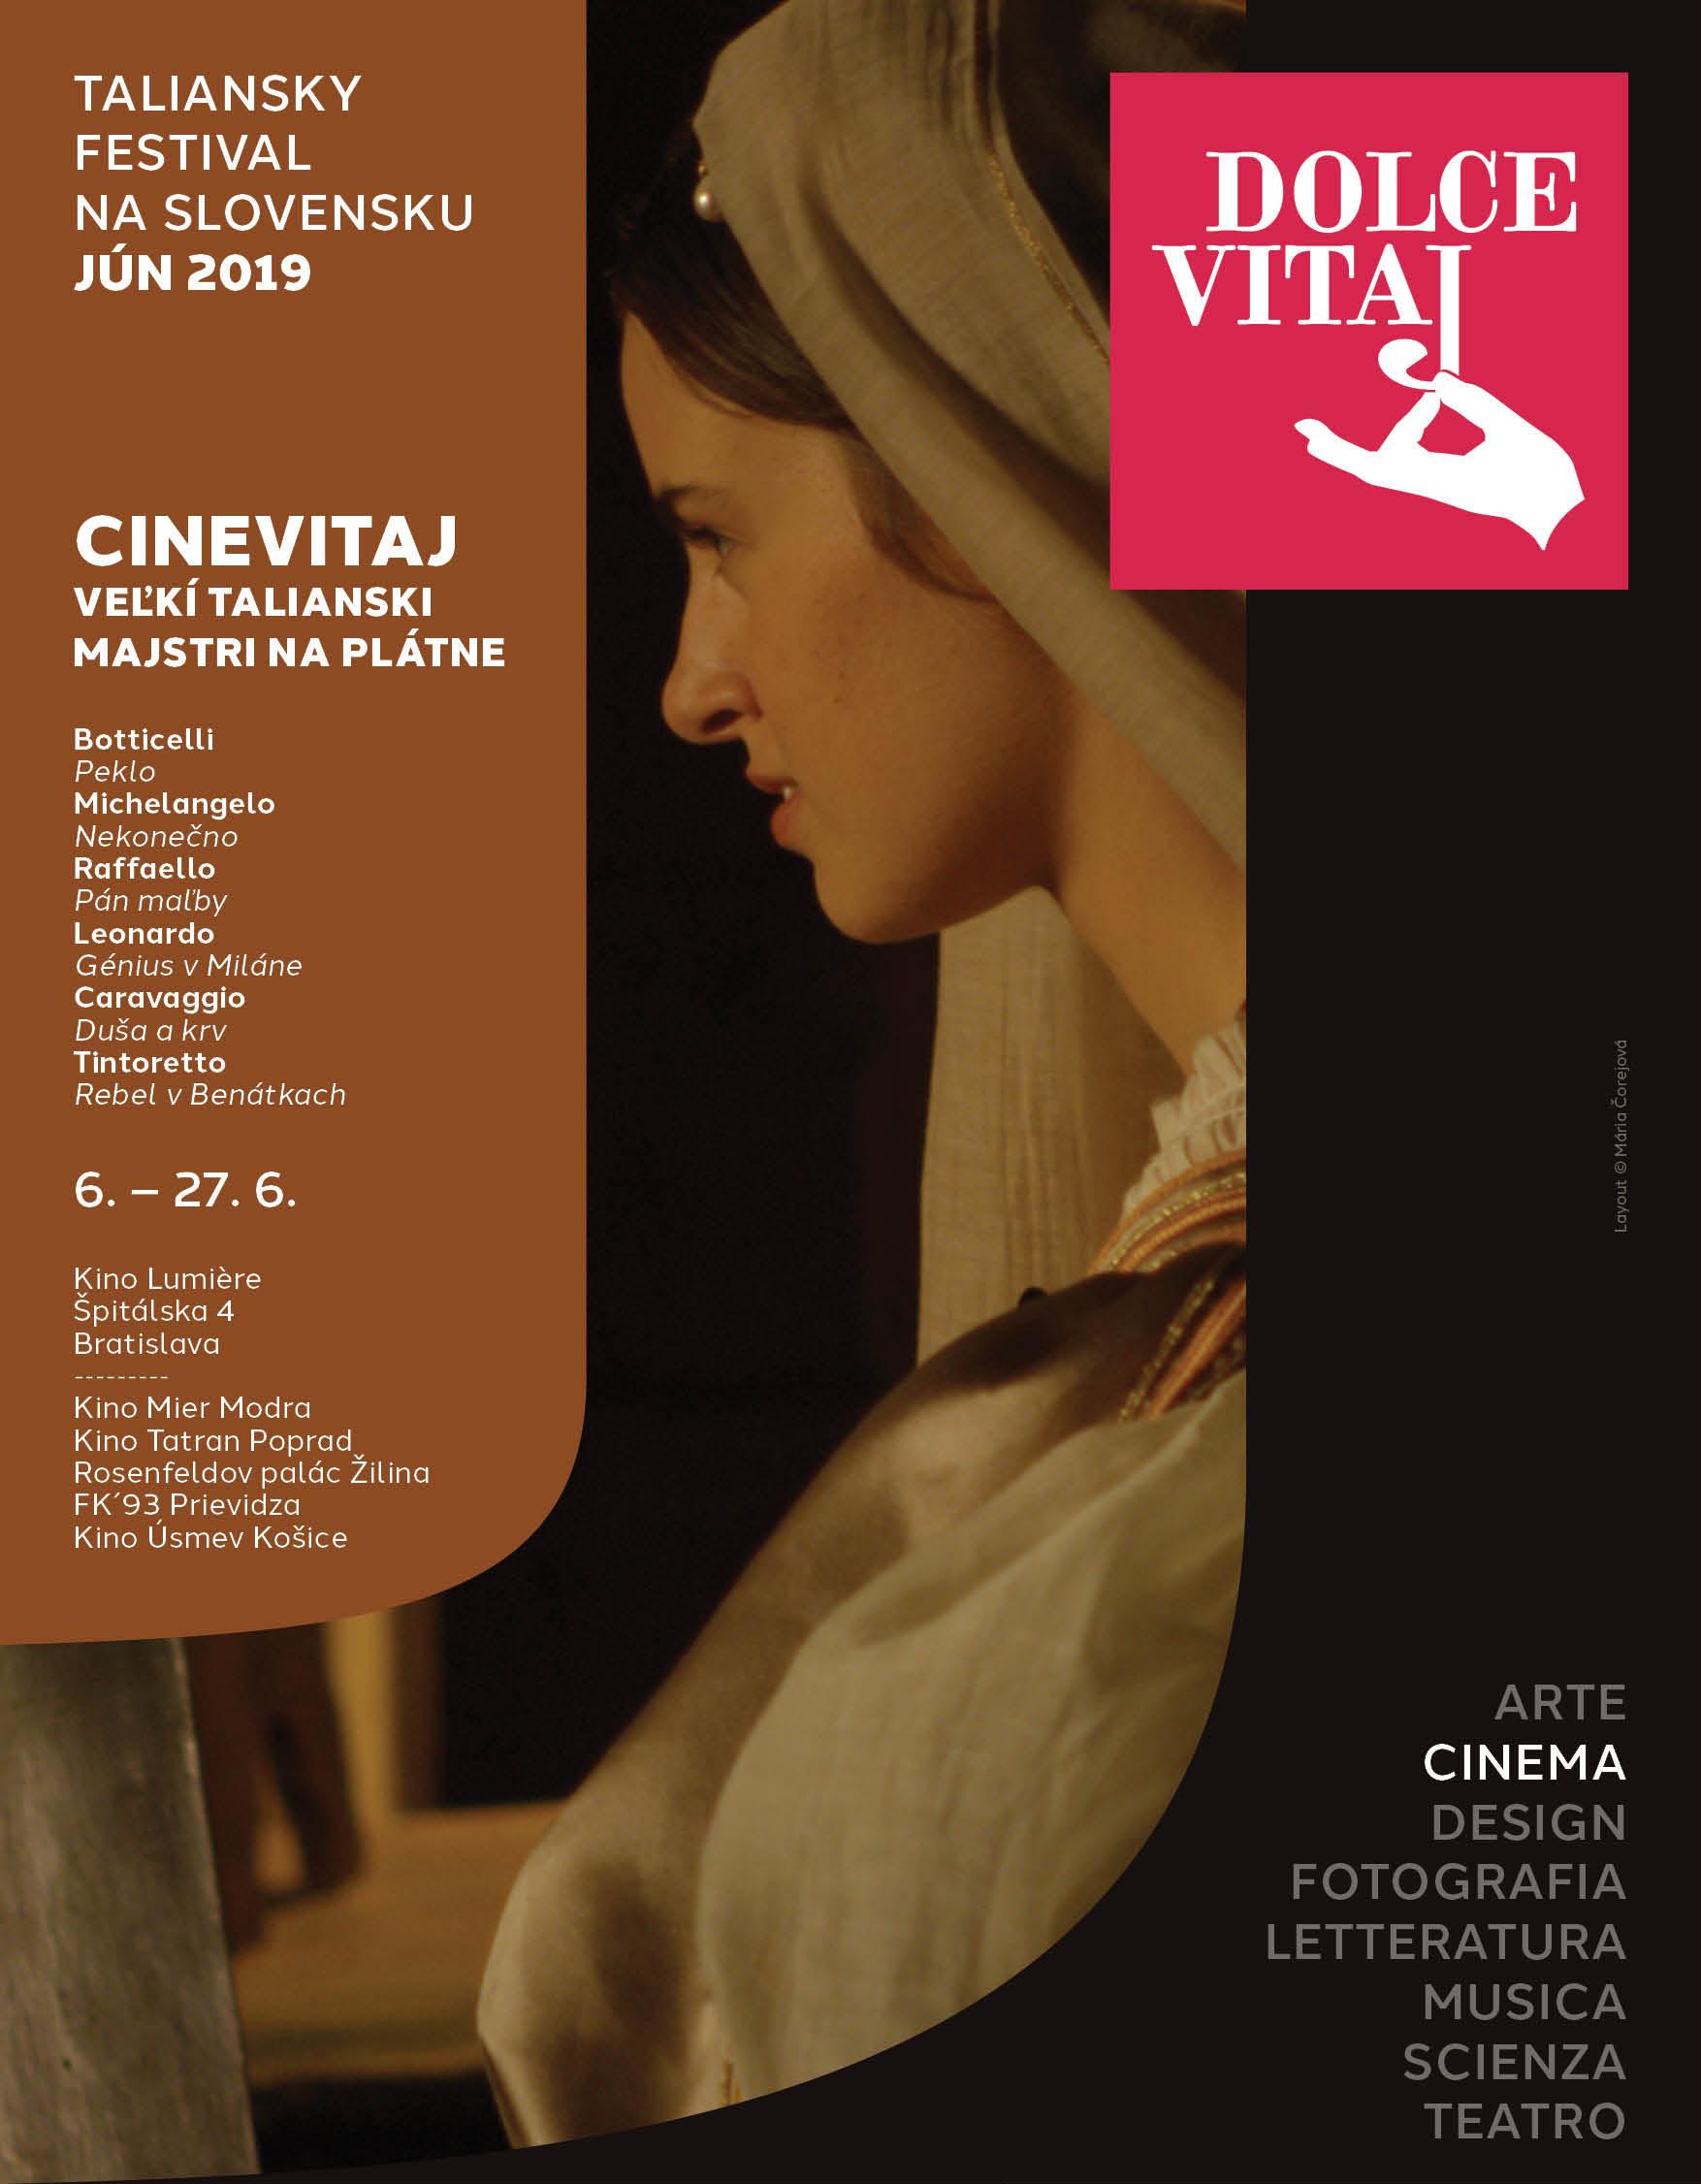 Dolce vitaj 2019 visual CINEVITAJ